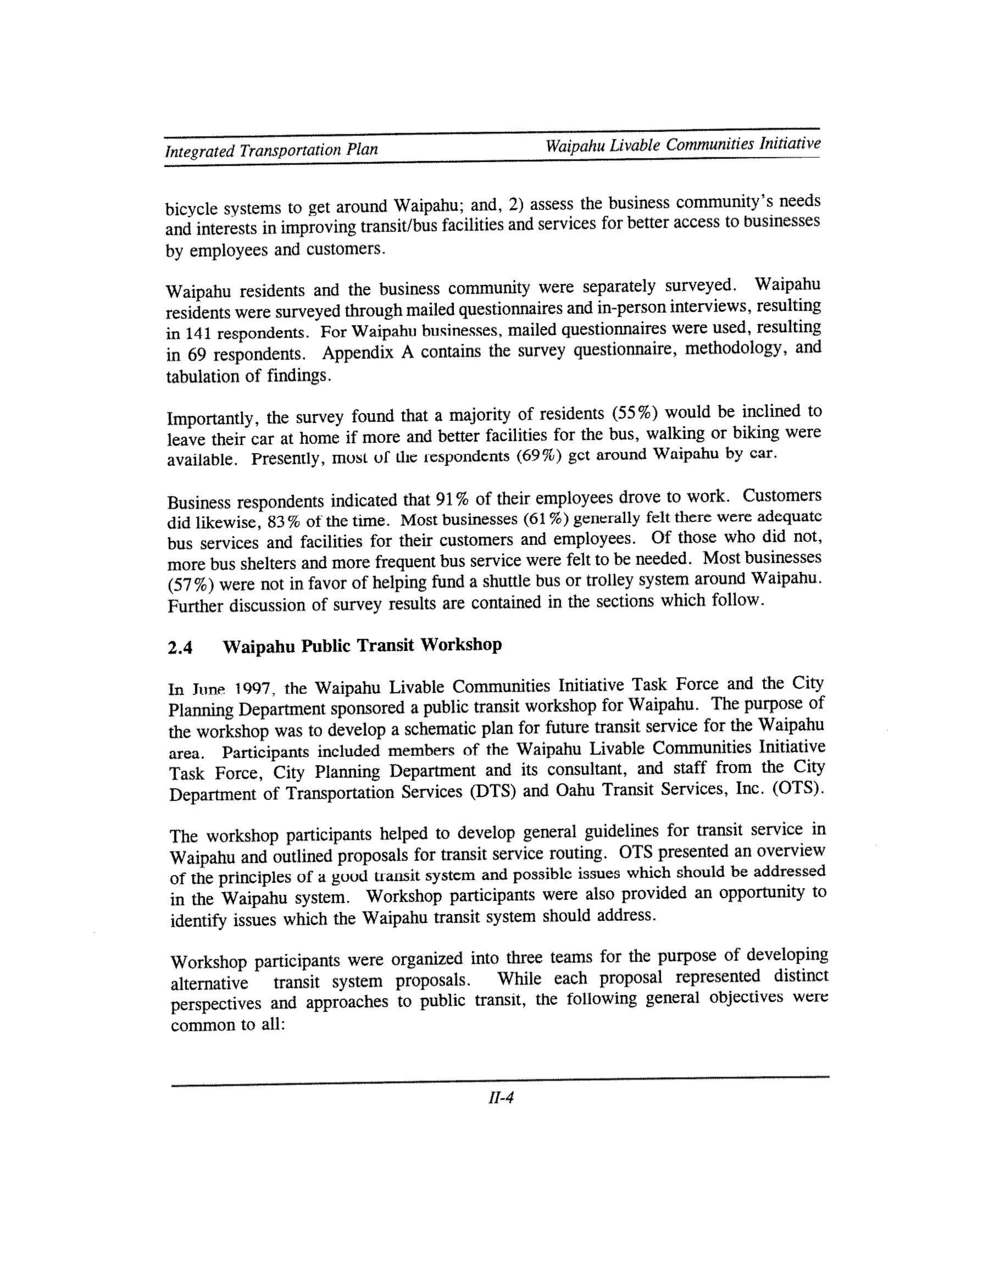 160531_WaipahuLivableCommunities(1998)_Page_019.jpg